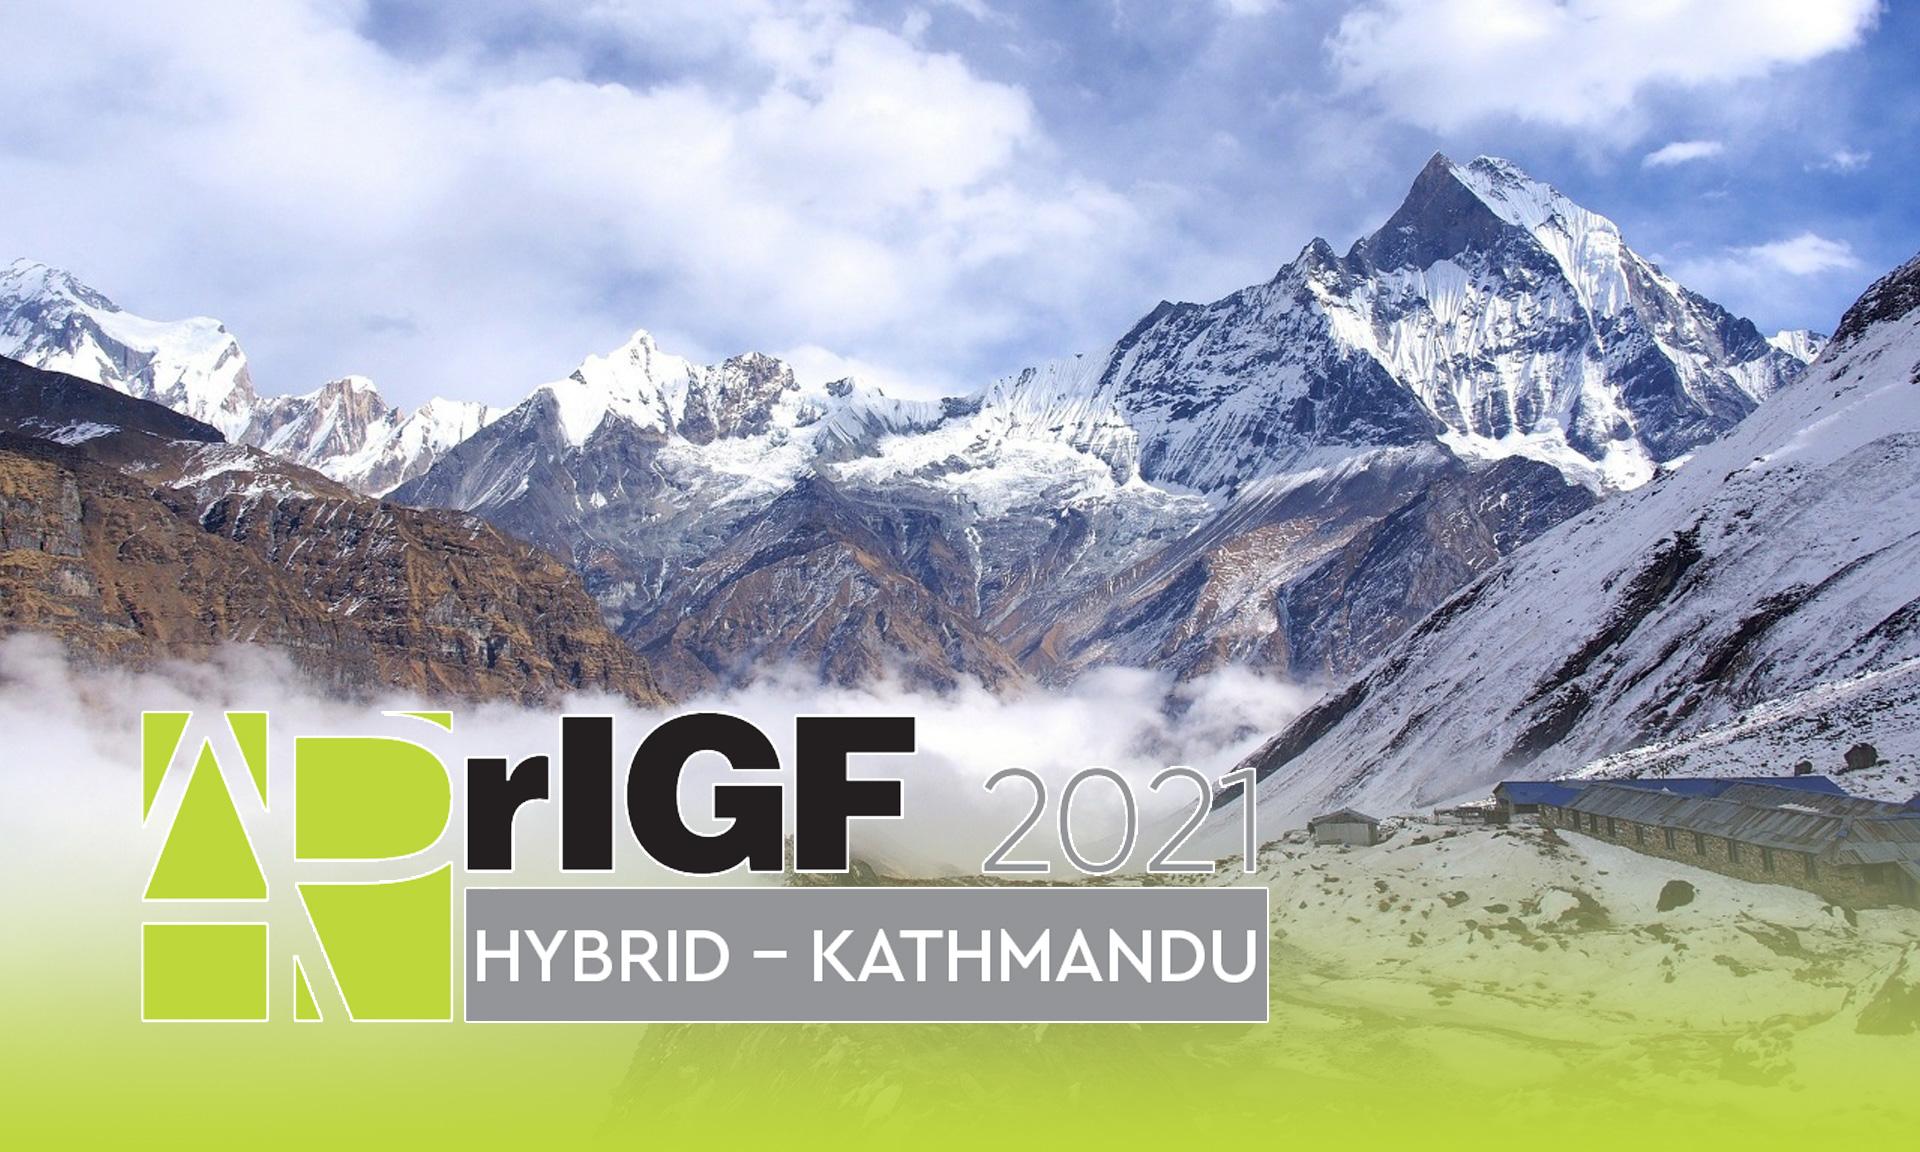 APrIGF 2021 - Hybrid Kathmandu